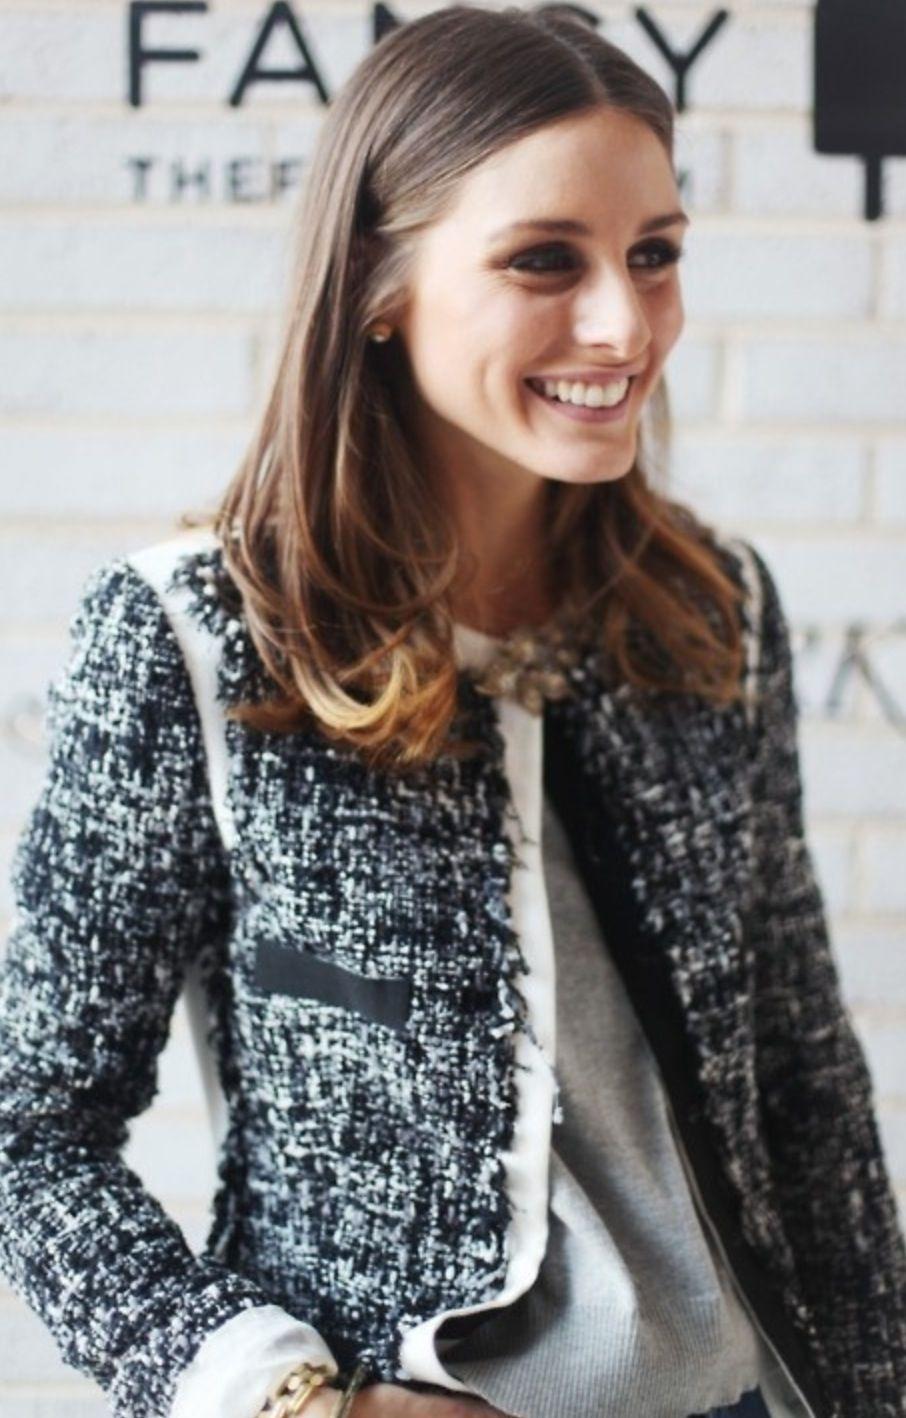 Image 1 of TWEED JACKET WITH SEQUINS from Zara | Tweed